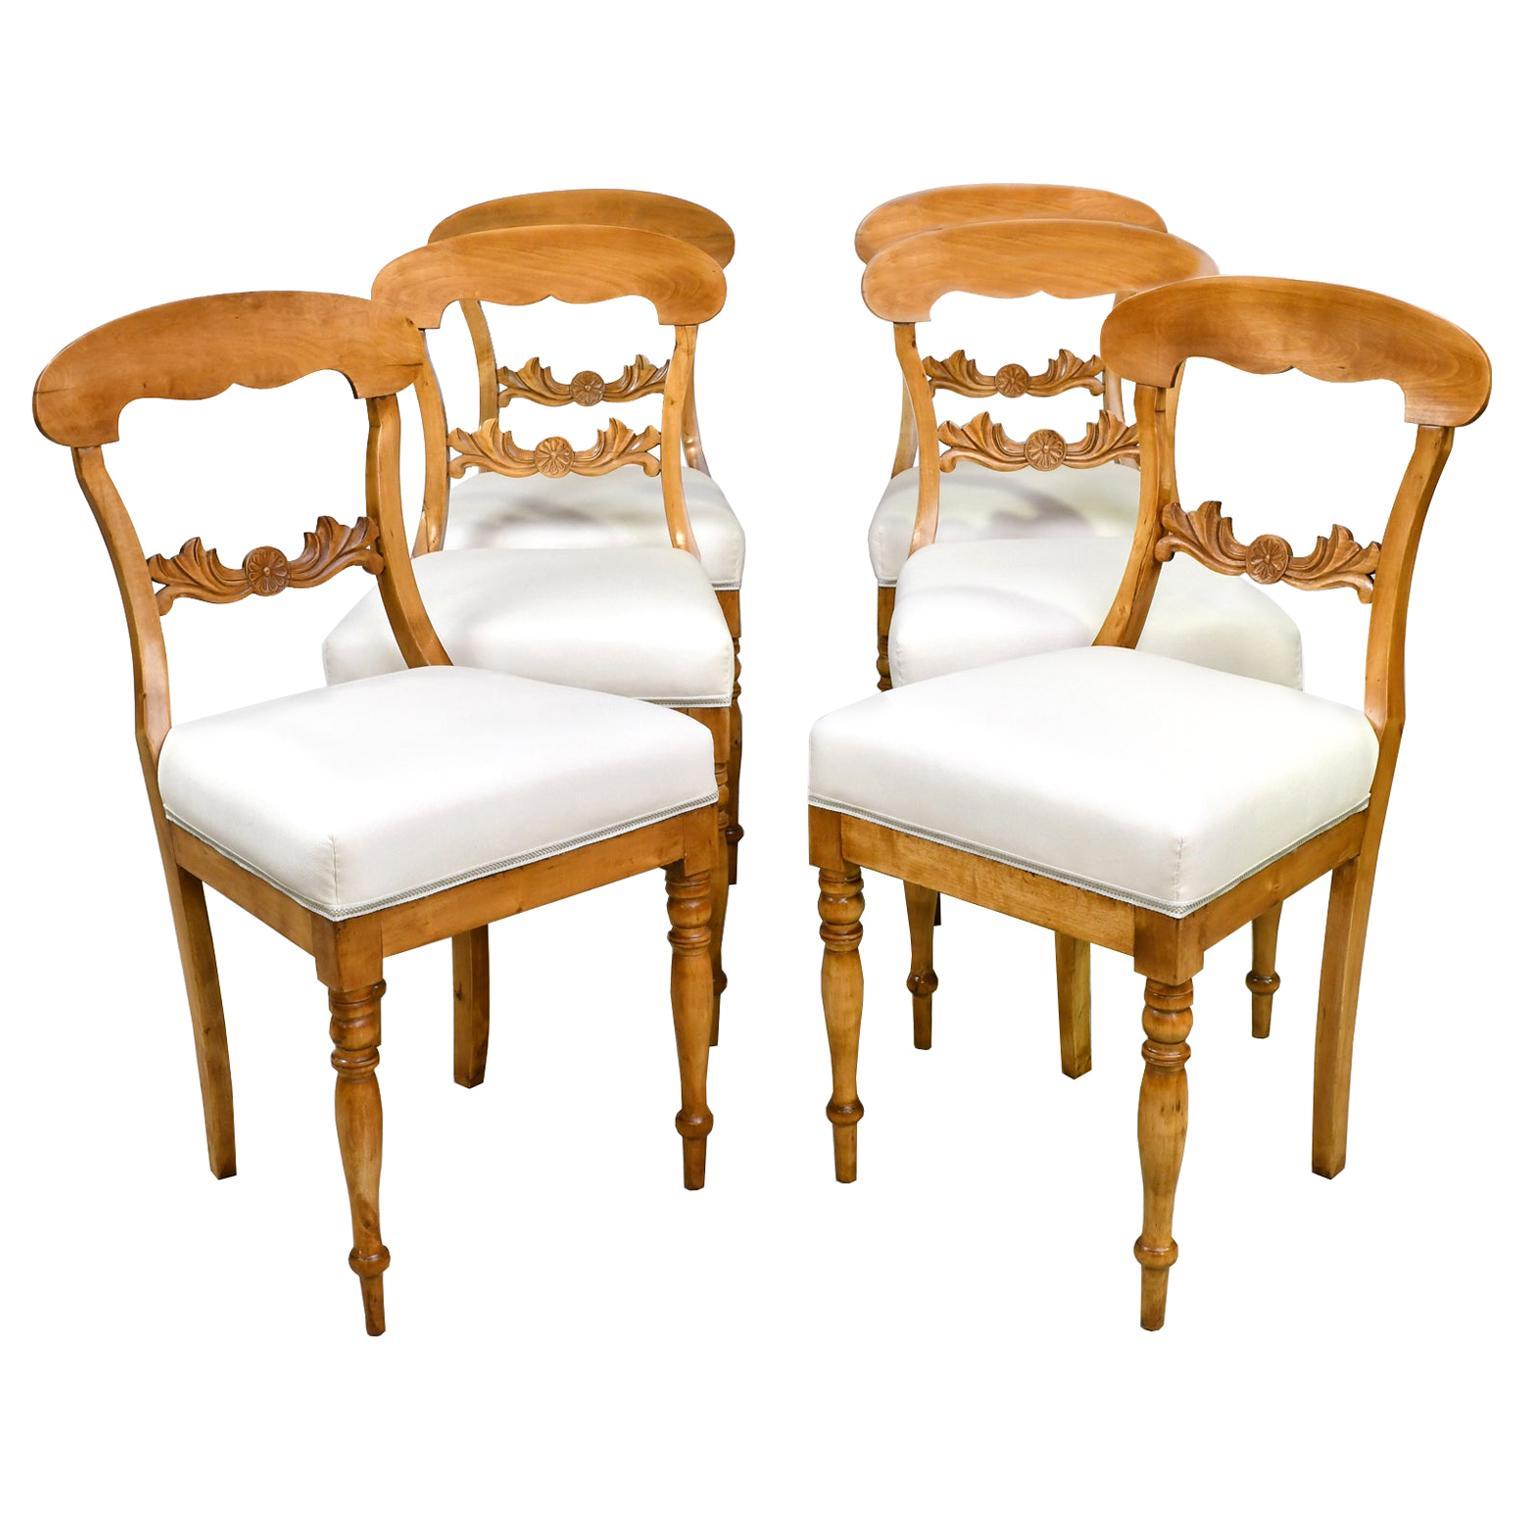 Set of Six Swedish Karl Johan Biedermeier Dining Chairs in Birch, circa 1825